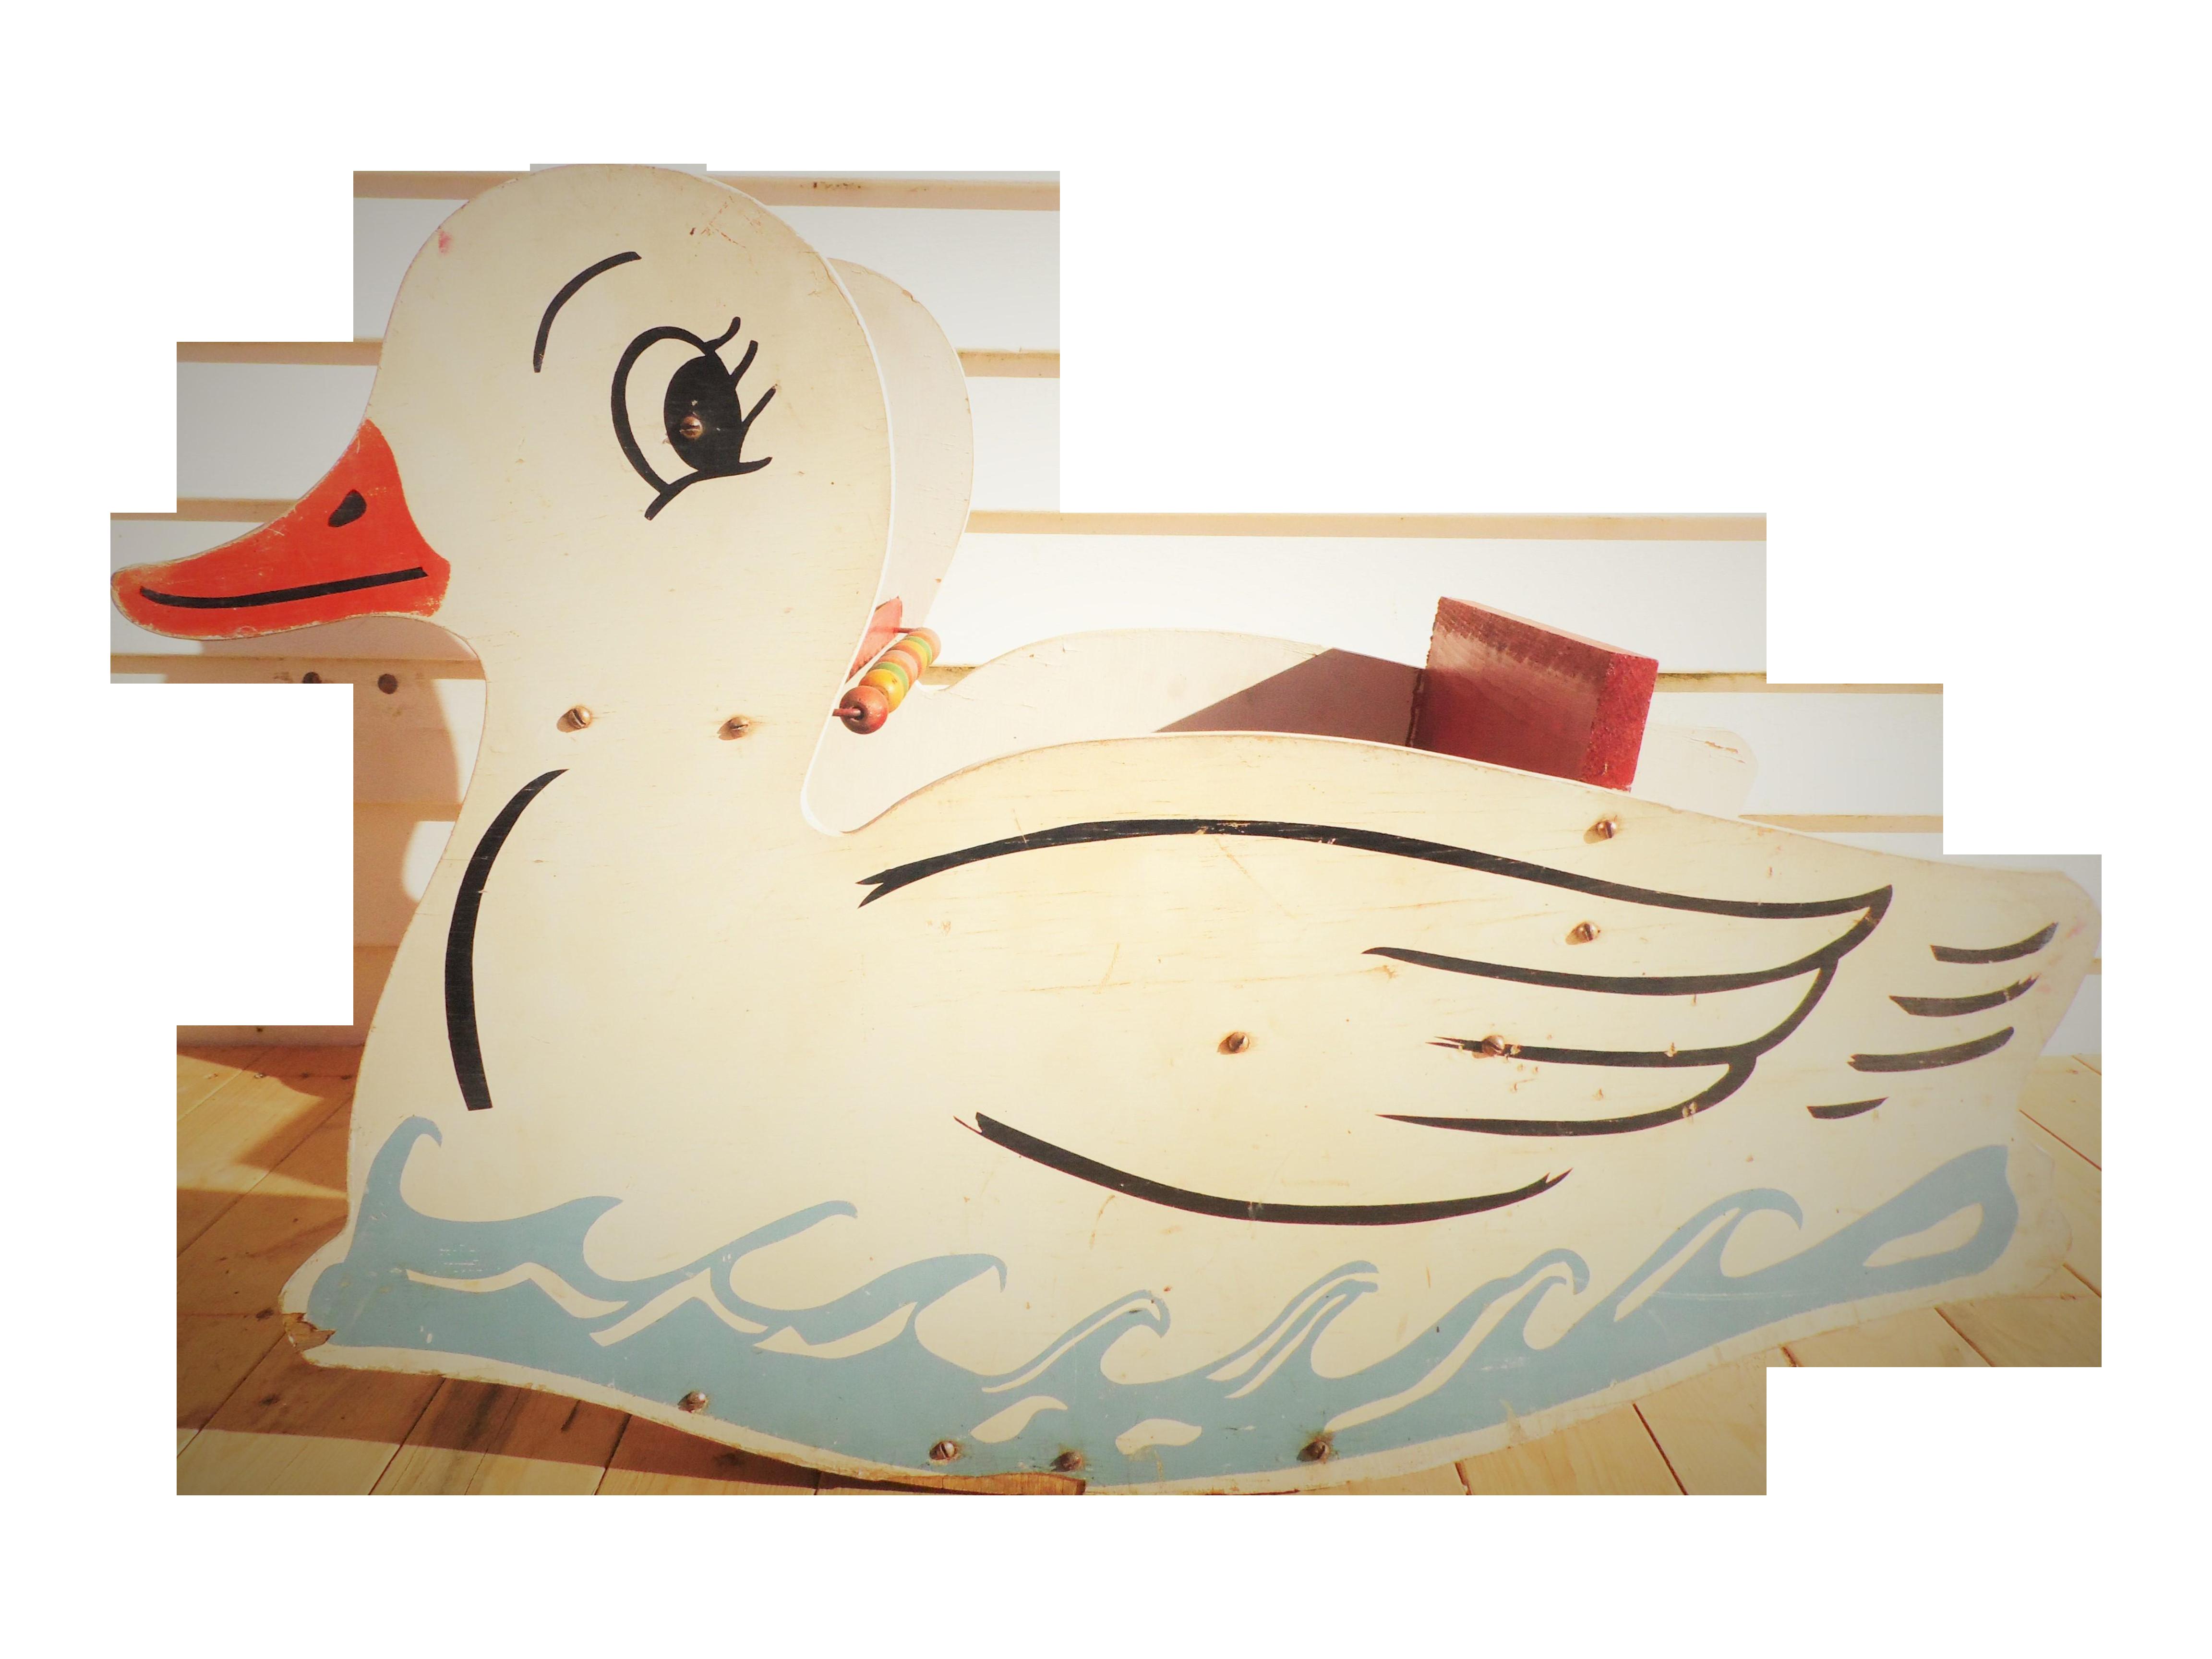 Vintage Wooden Duck Rocker